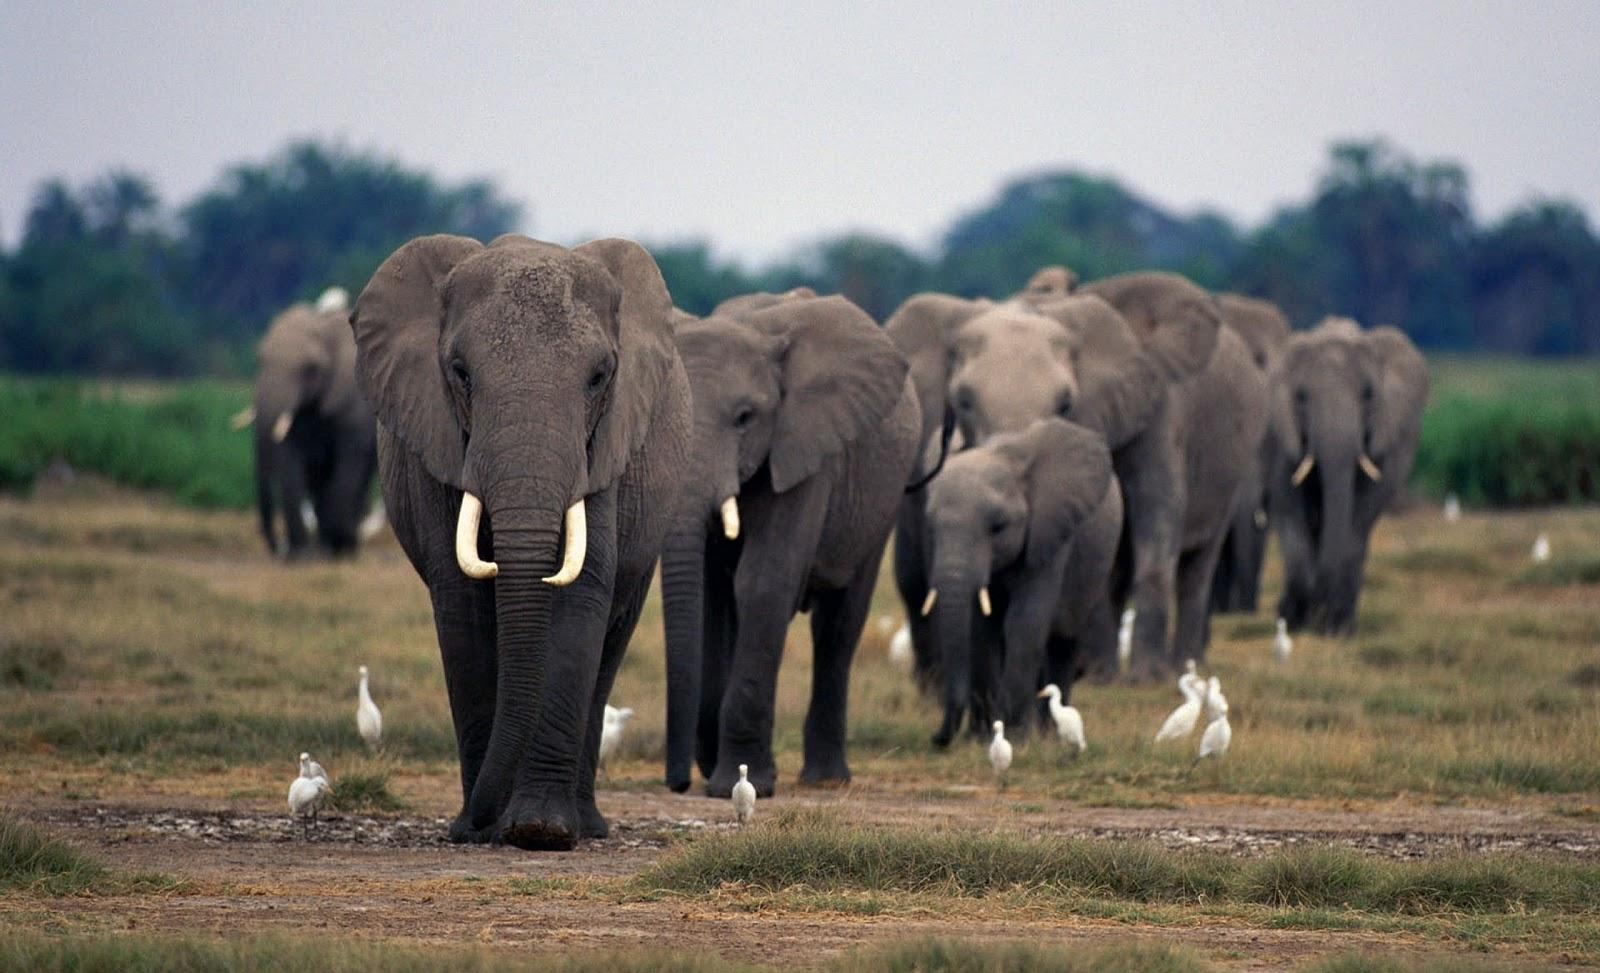 elephants wallpapers world - photo #20